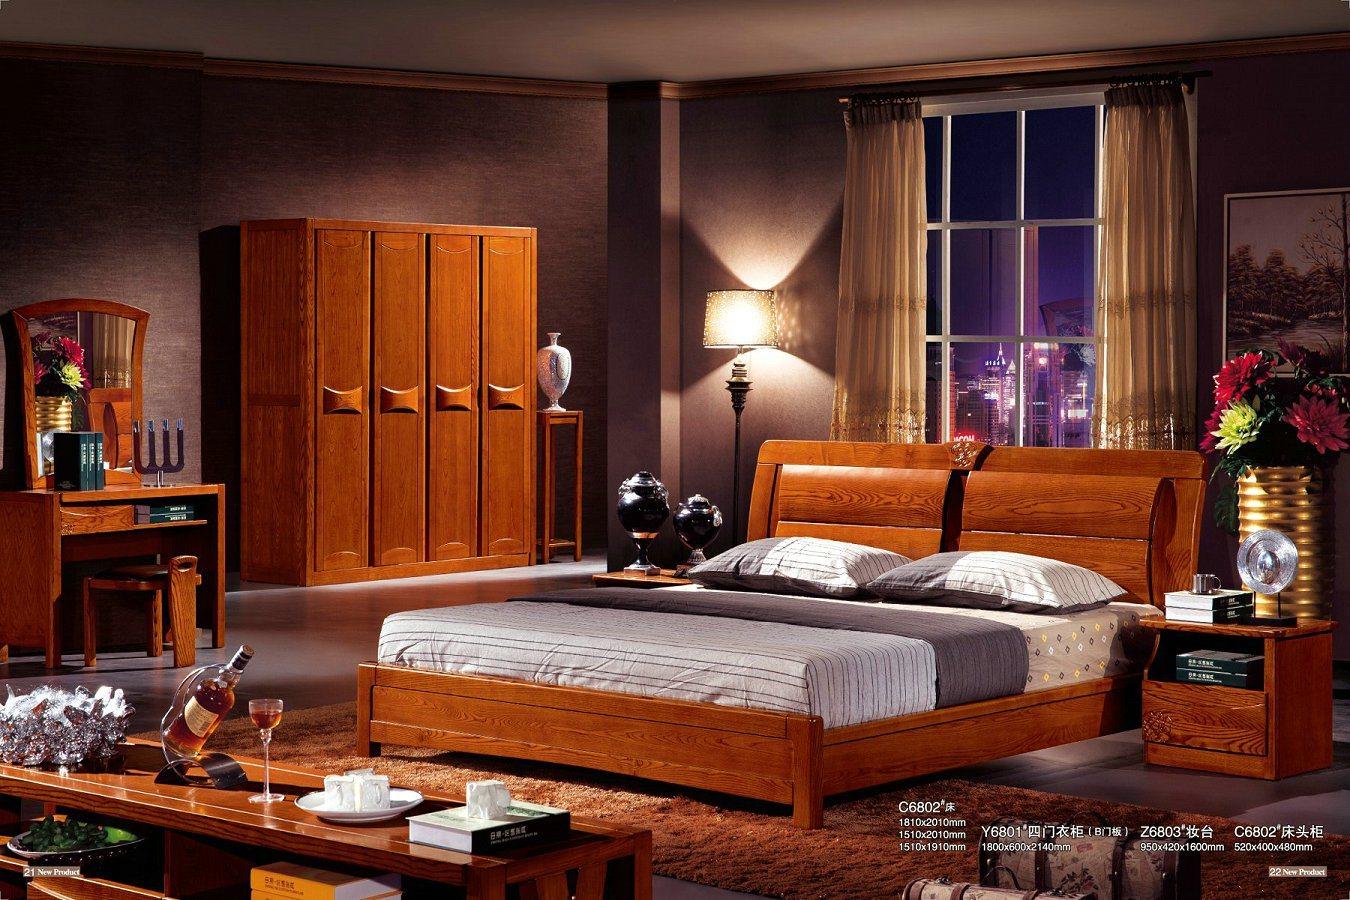 Solid Wood Bedroom Furniture China Bedroom Furniture Solid Wood Bed Photos Pictures Made In